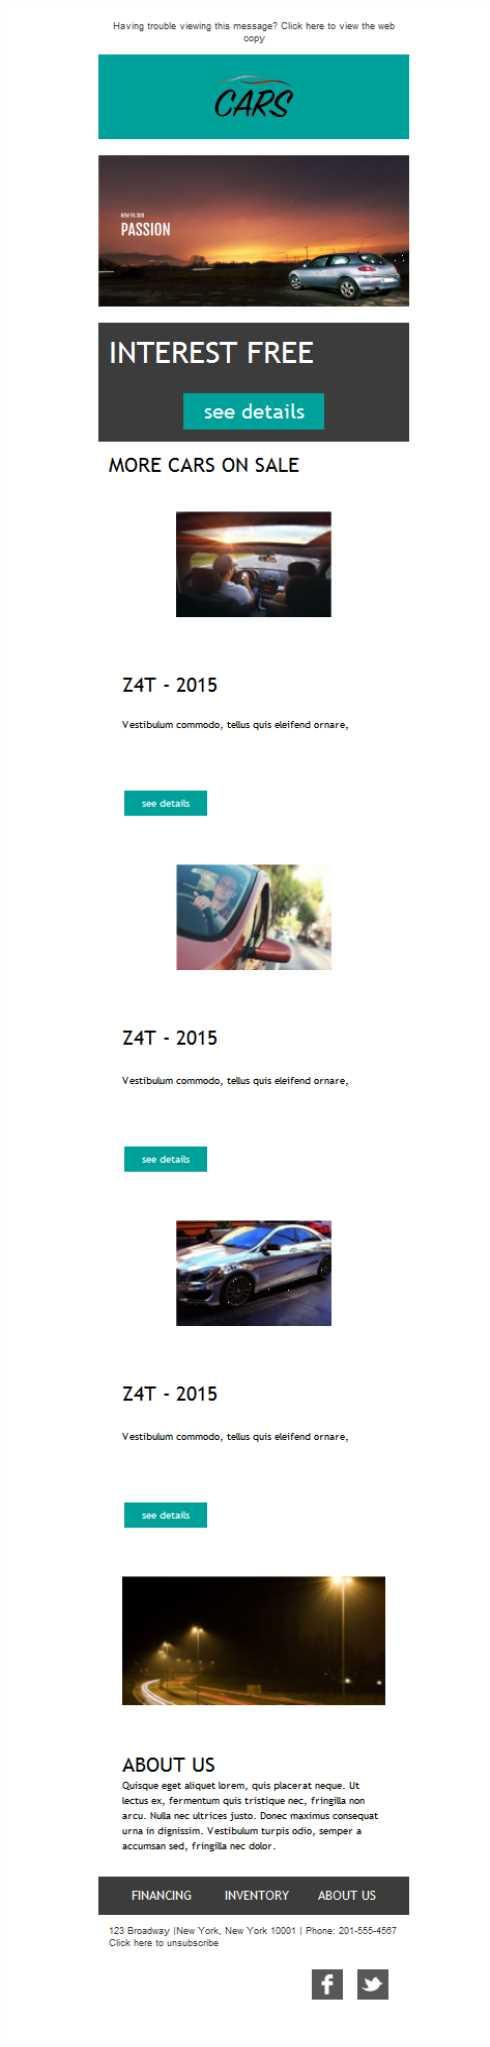 Free email templates - Download design Car Dealership